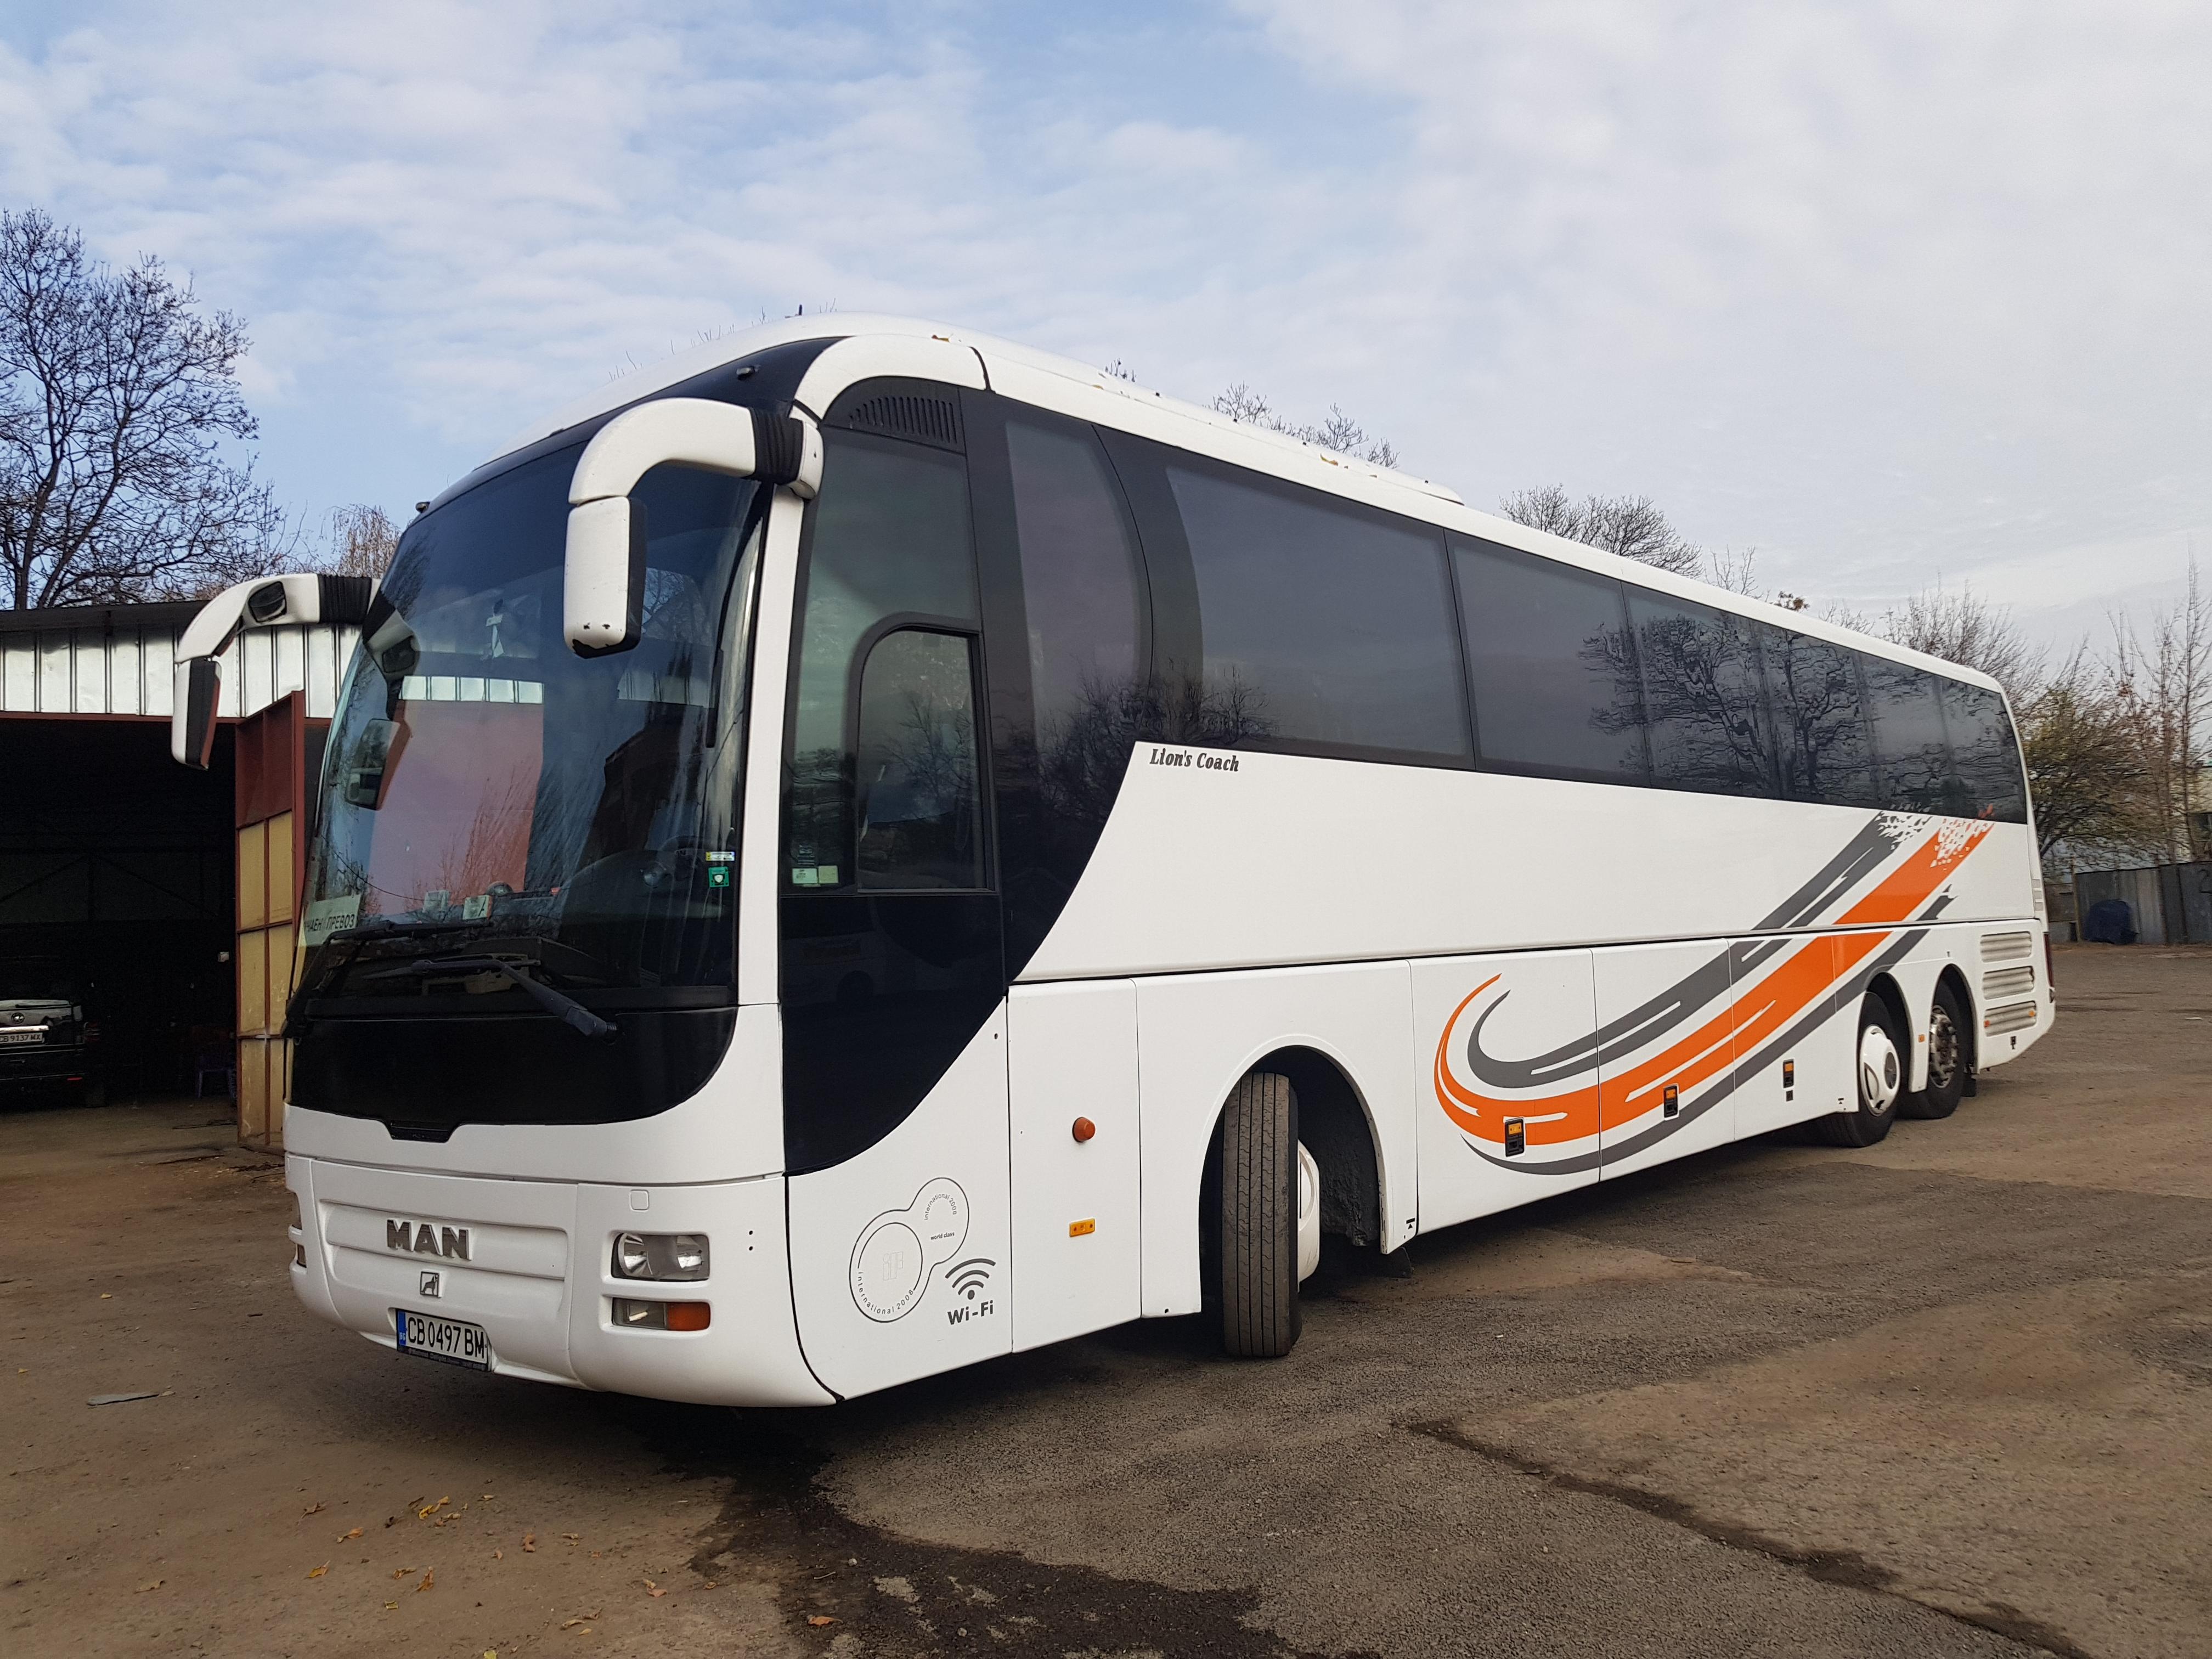 Автобус МАН, Места: 56+1